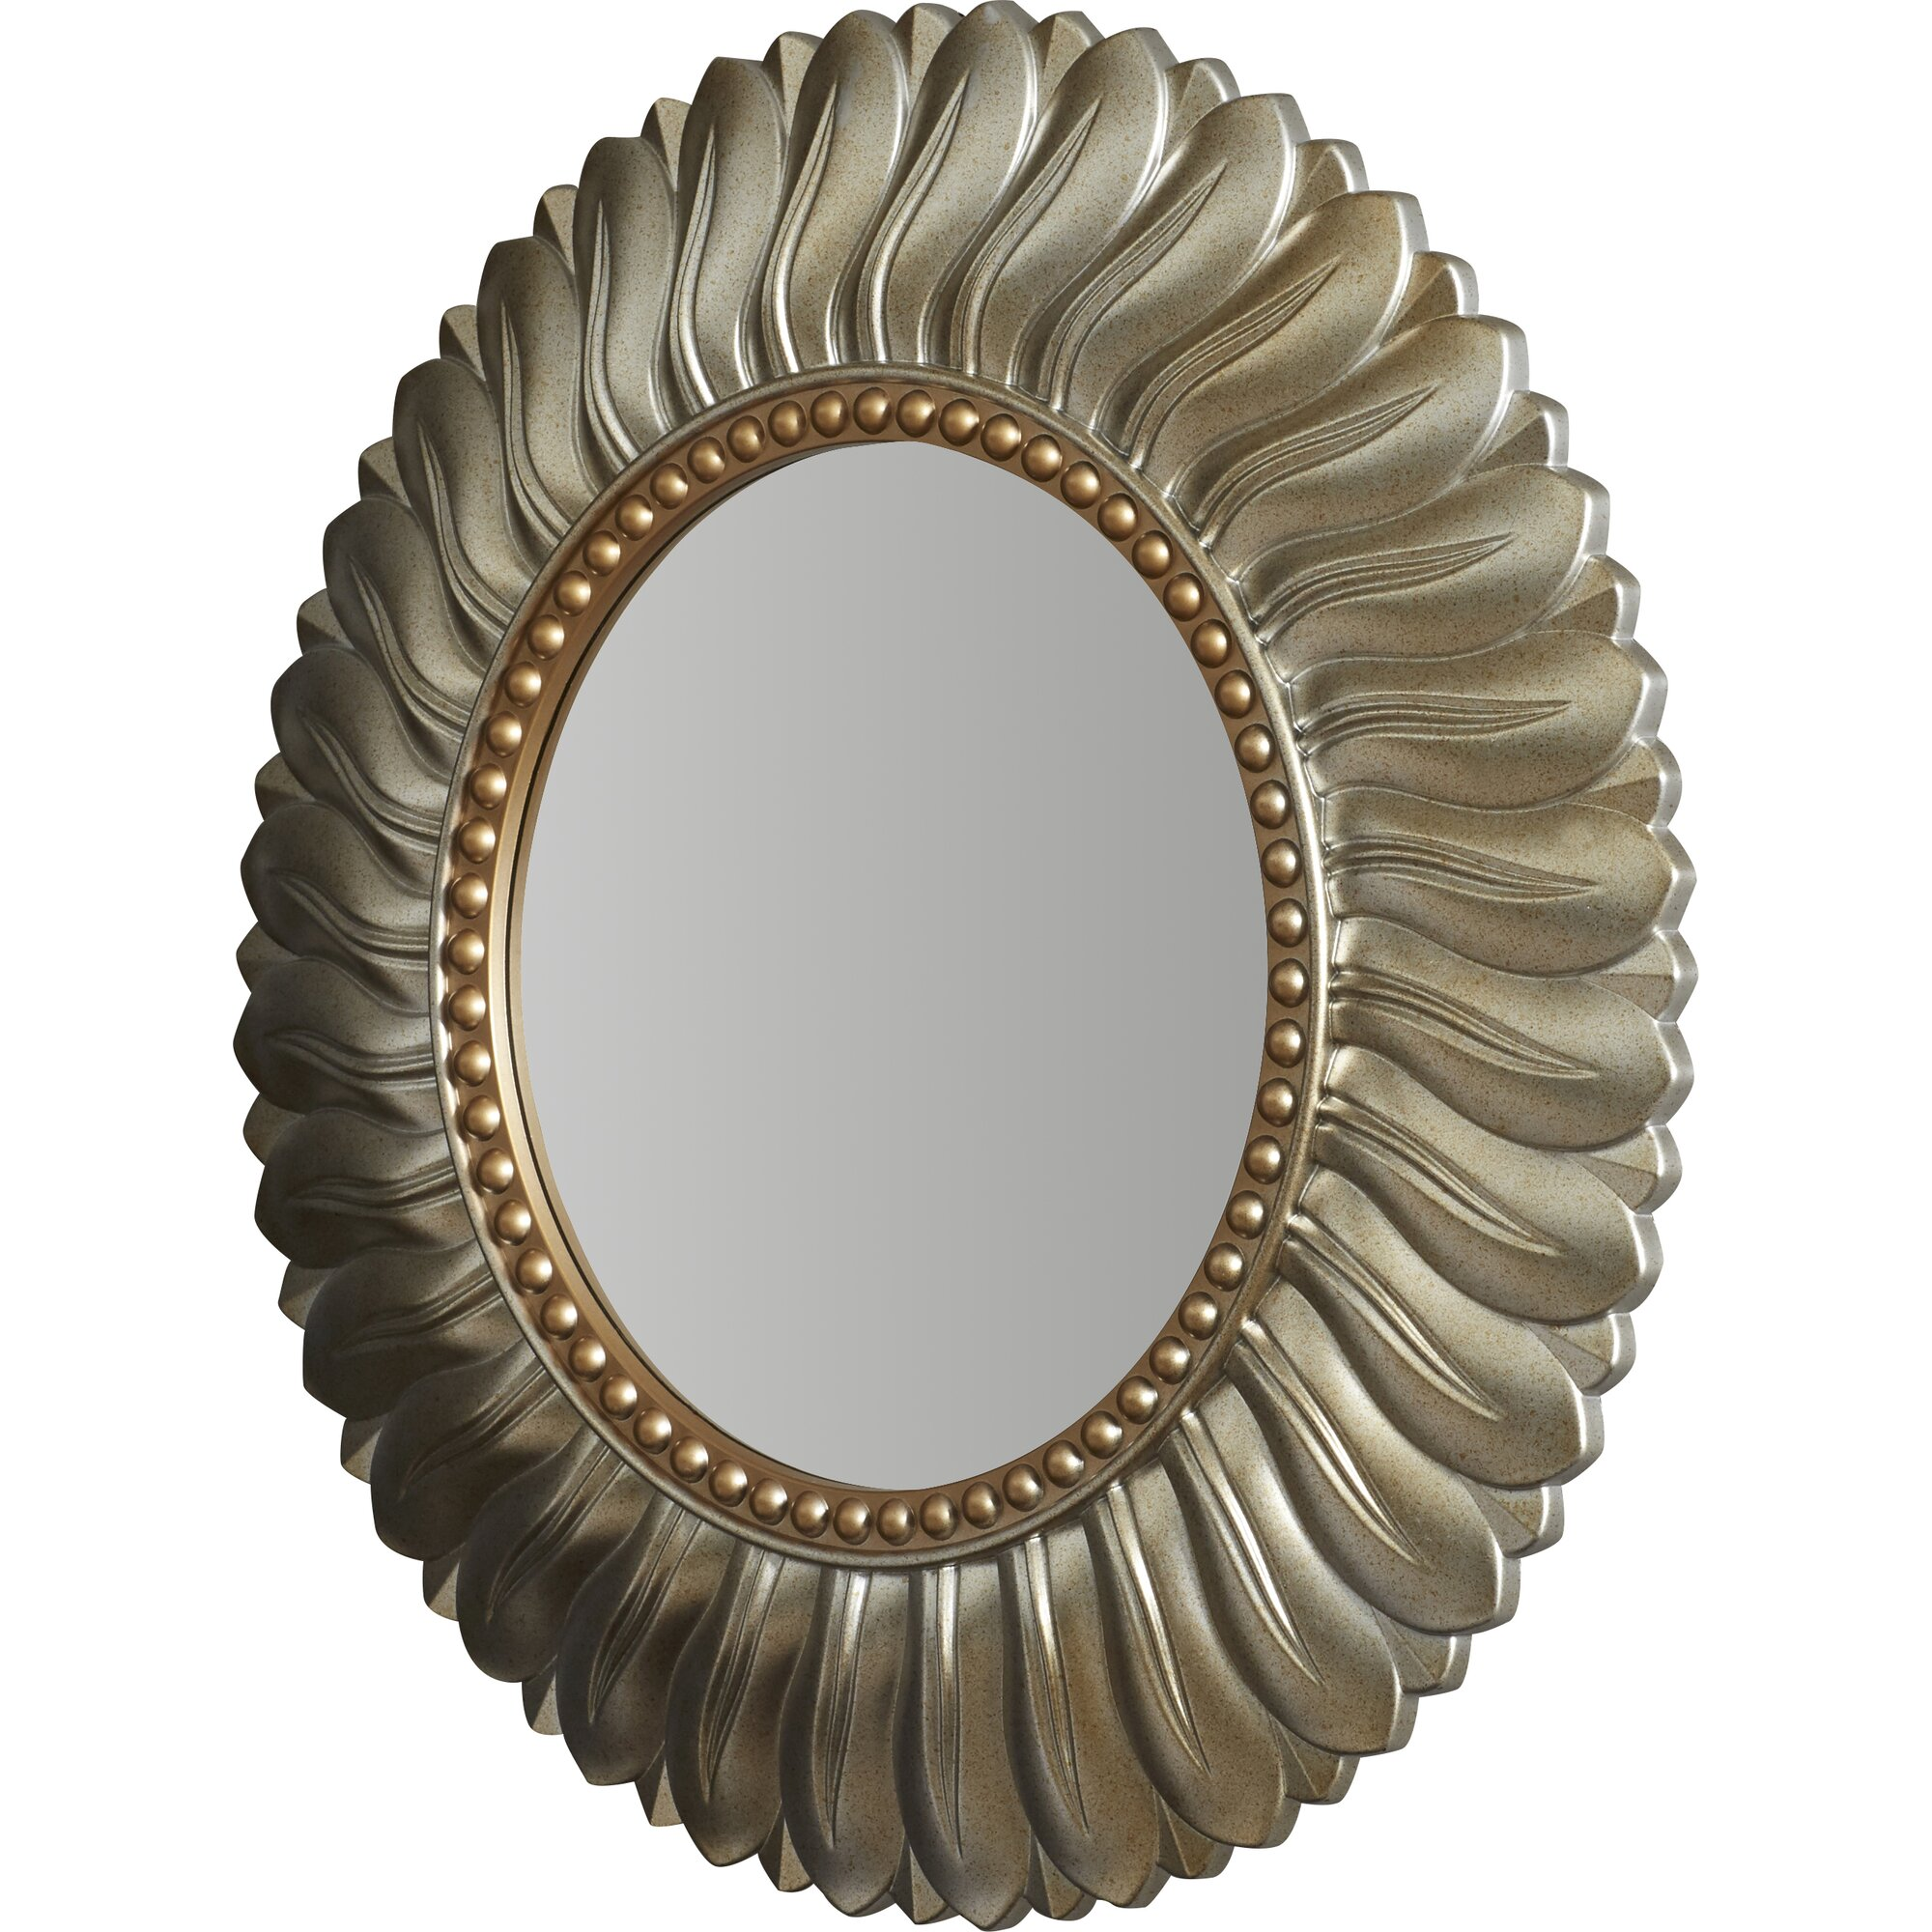 Willa Arlo Interiors Vertical Round Resin Wall Mirror